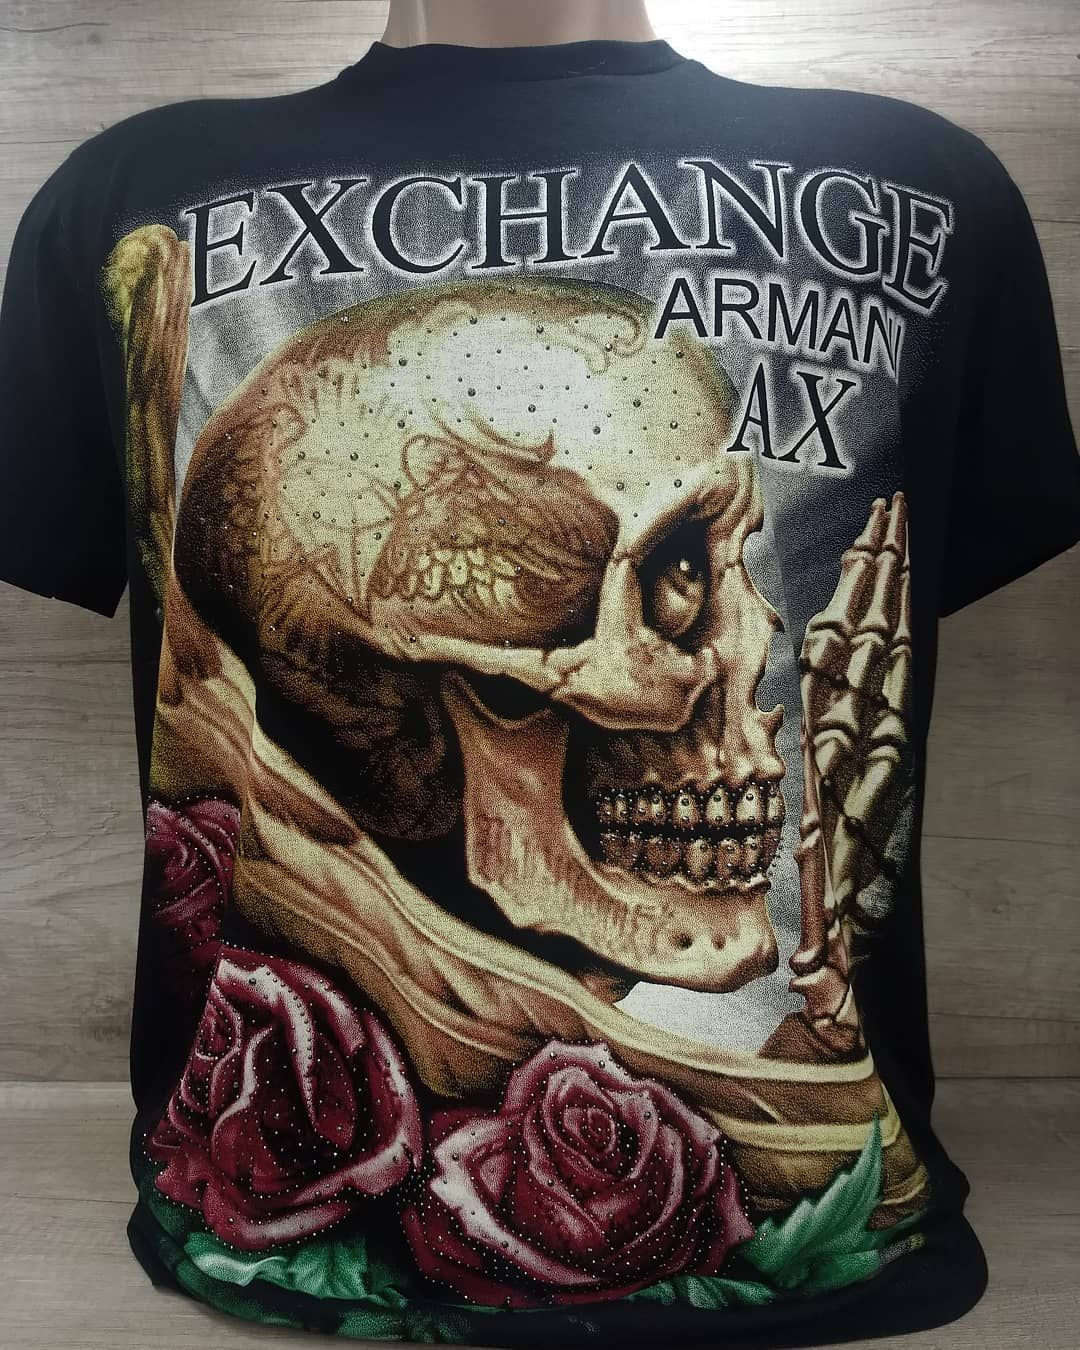 ac9253cf337 Camiseta Armani Exchange malha Peruana com pedraria cod 089 R 59.99  Tamanhos disponíveis MG e GG